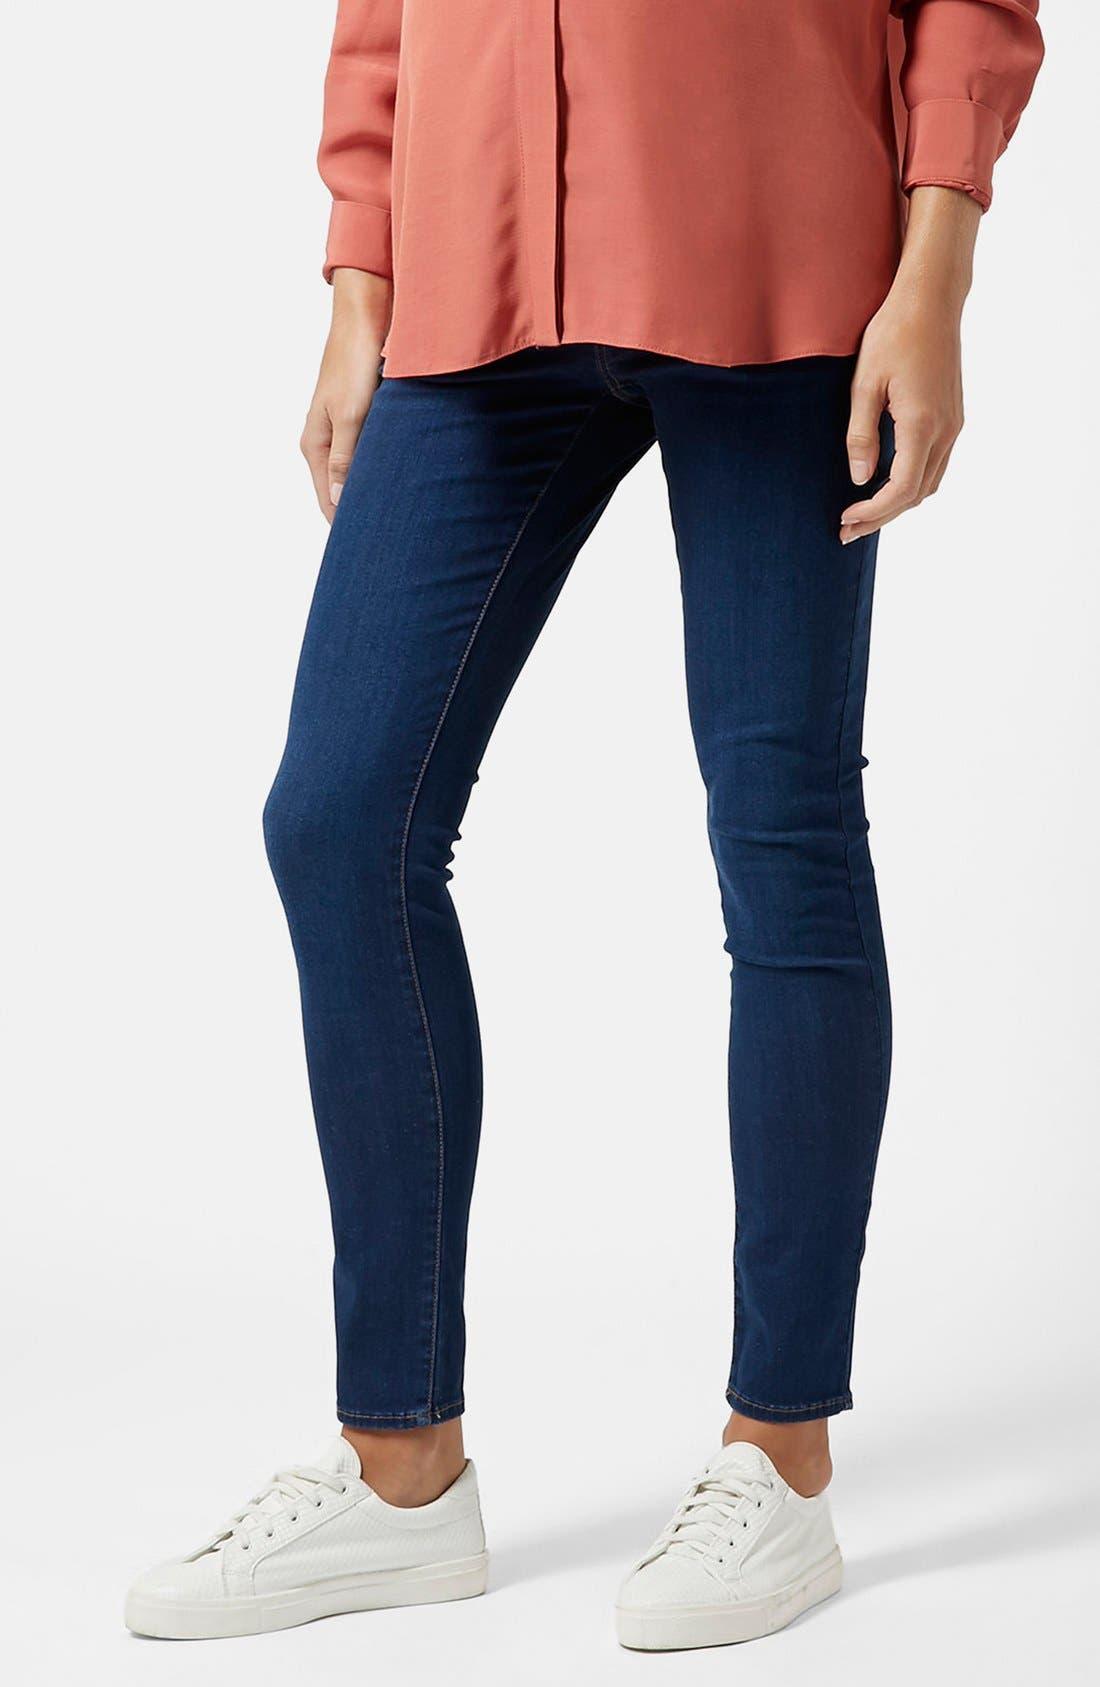 Alternate Image 1 Selected - Topshop Moto 'Leigh' Maternity Skinny Jeans (Regular & Short)